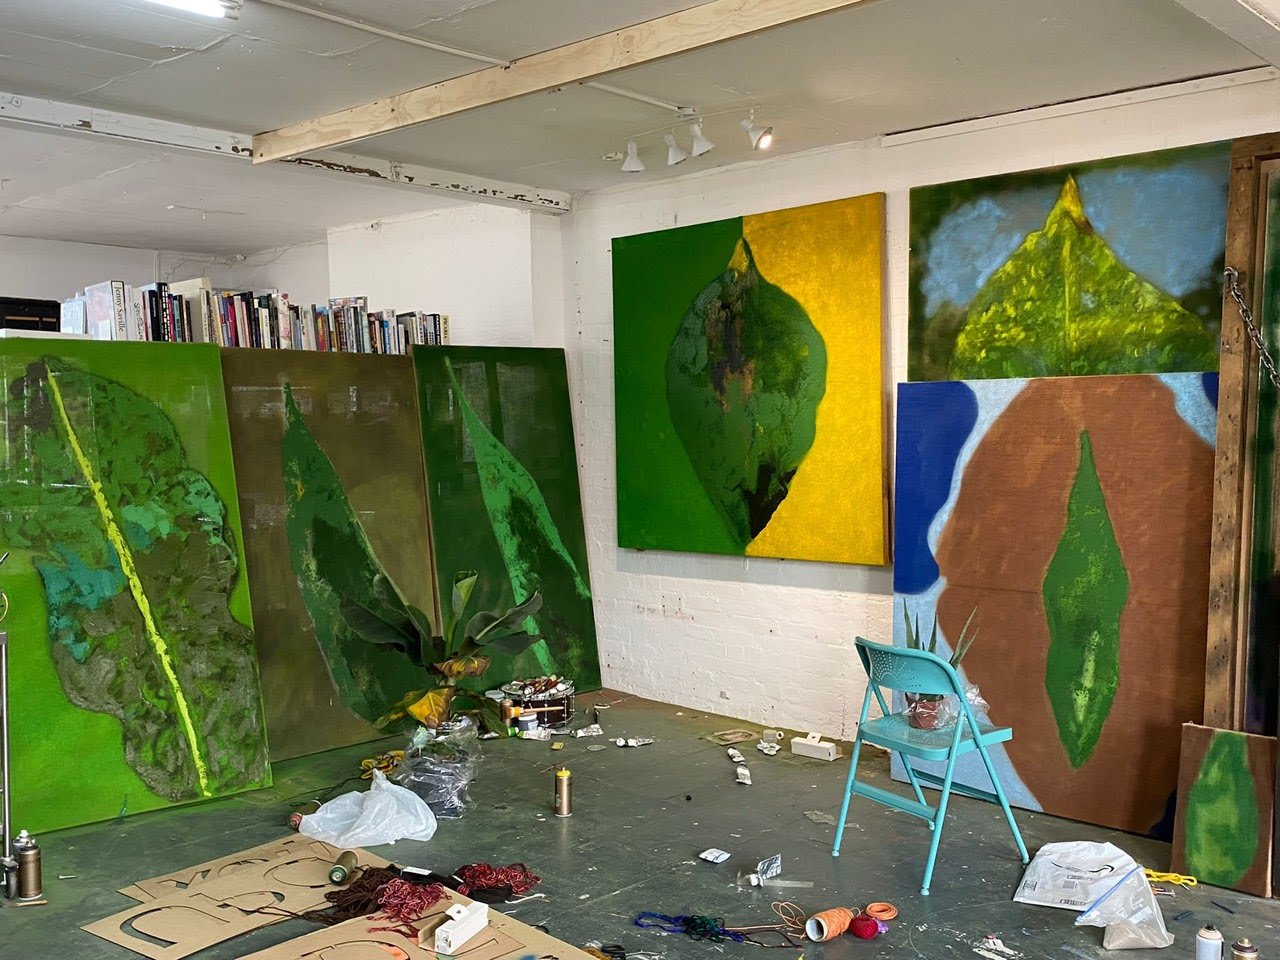 Alvaro Barrington studio, London, 2021. Courtesy of the artist.